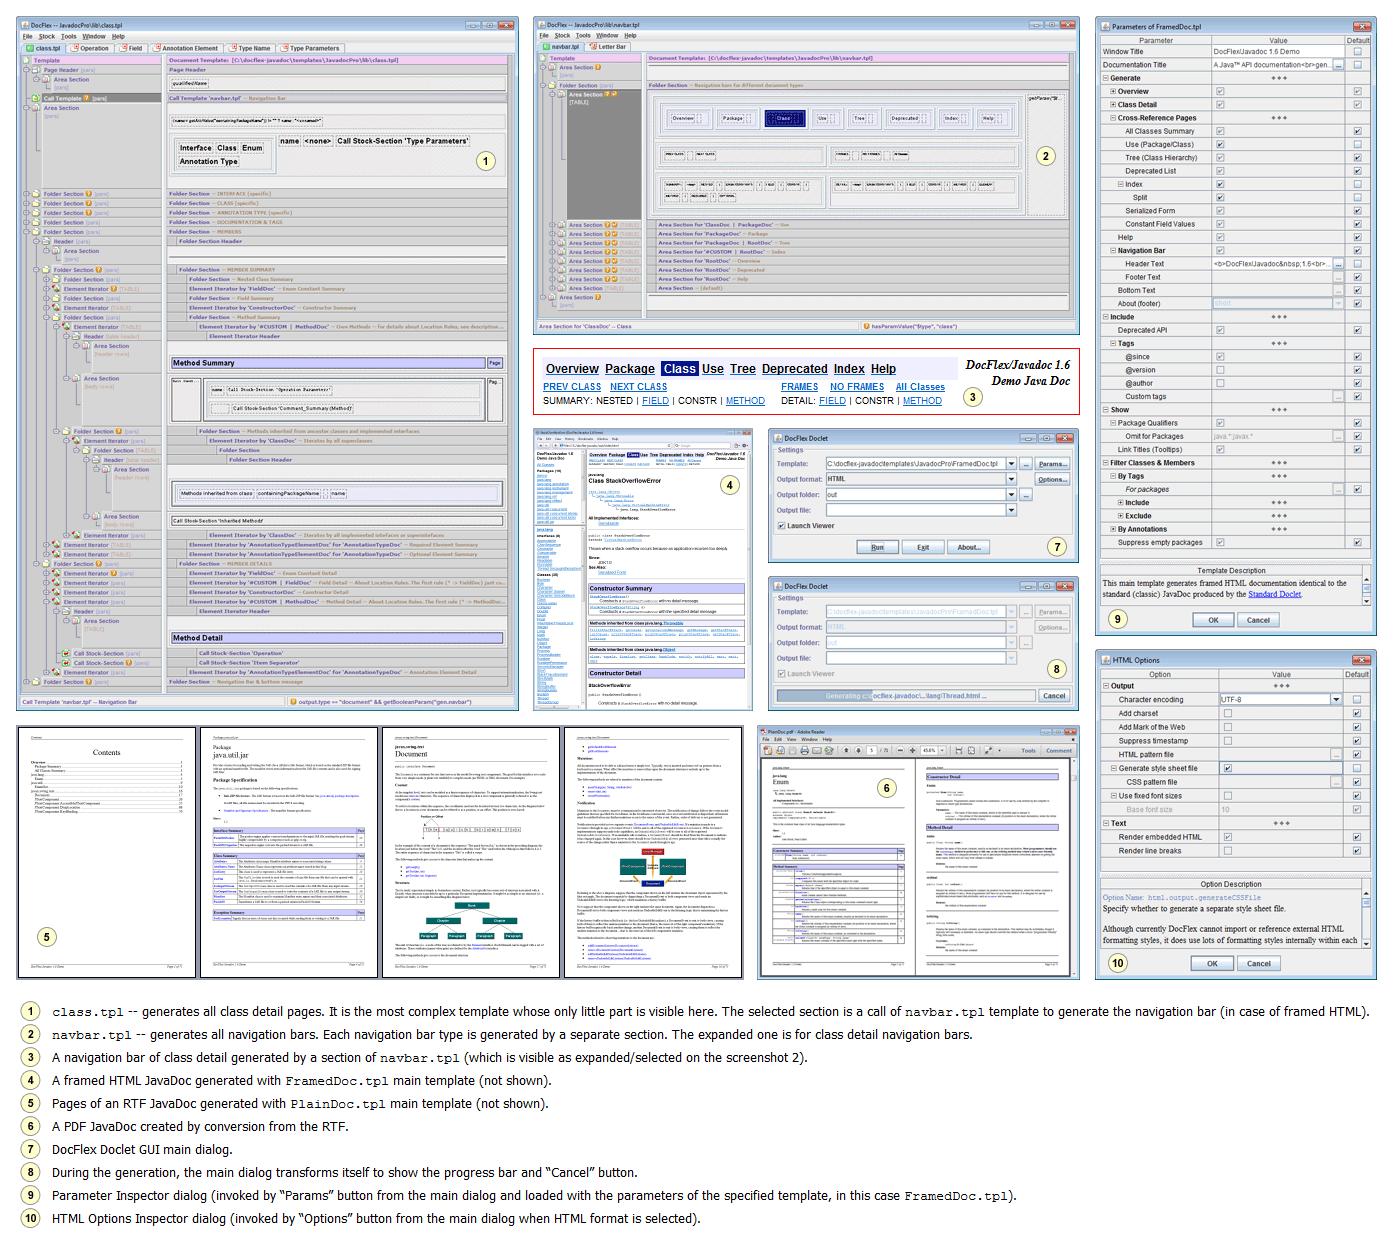 DocFlex/Javadoc